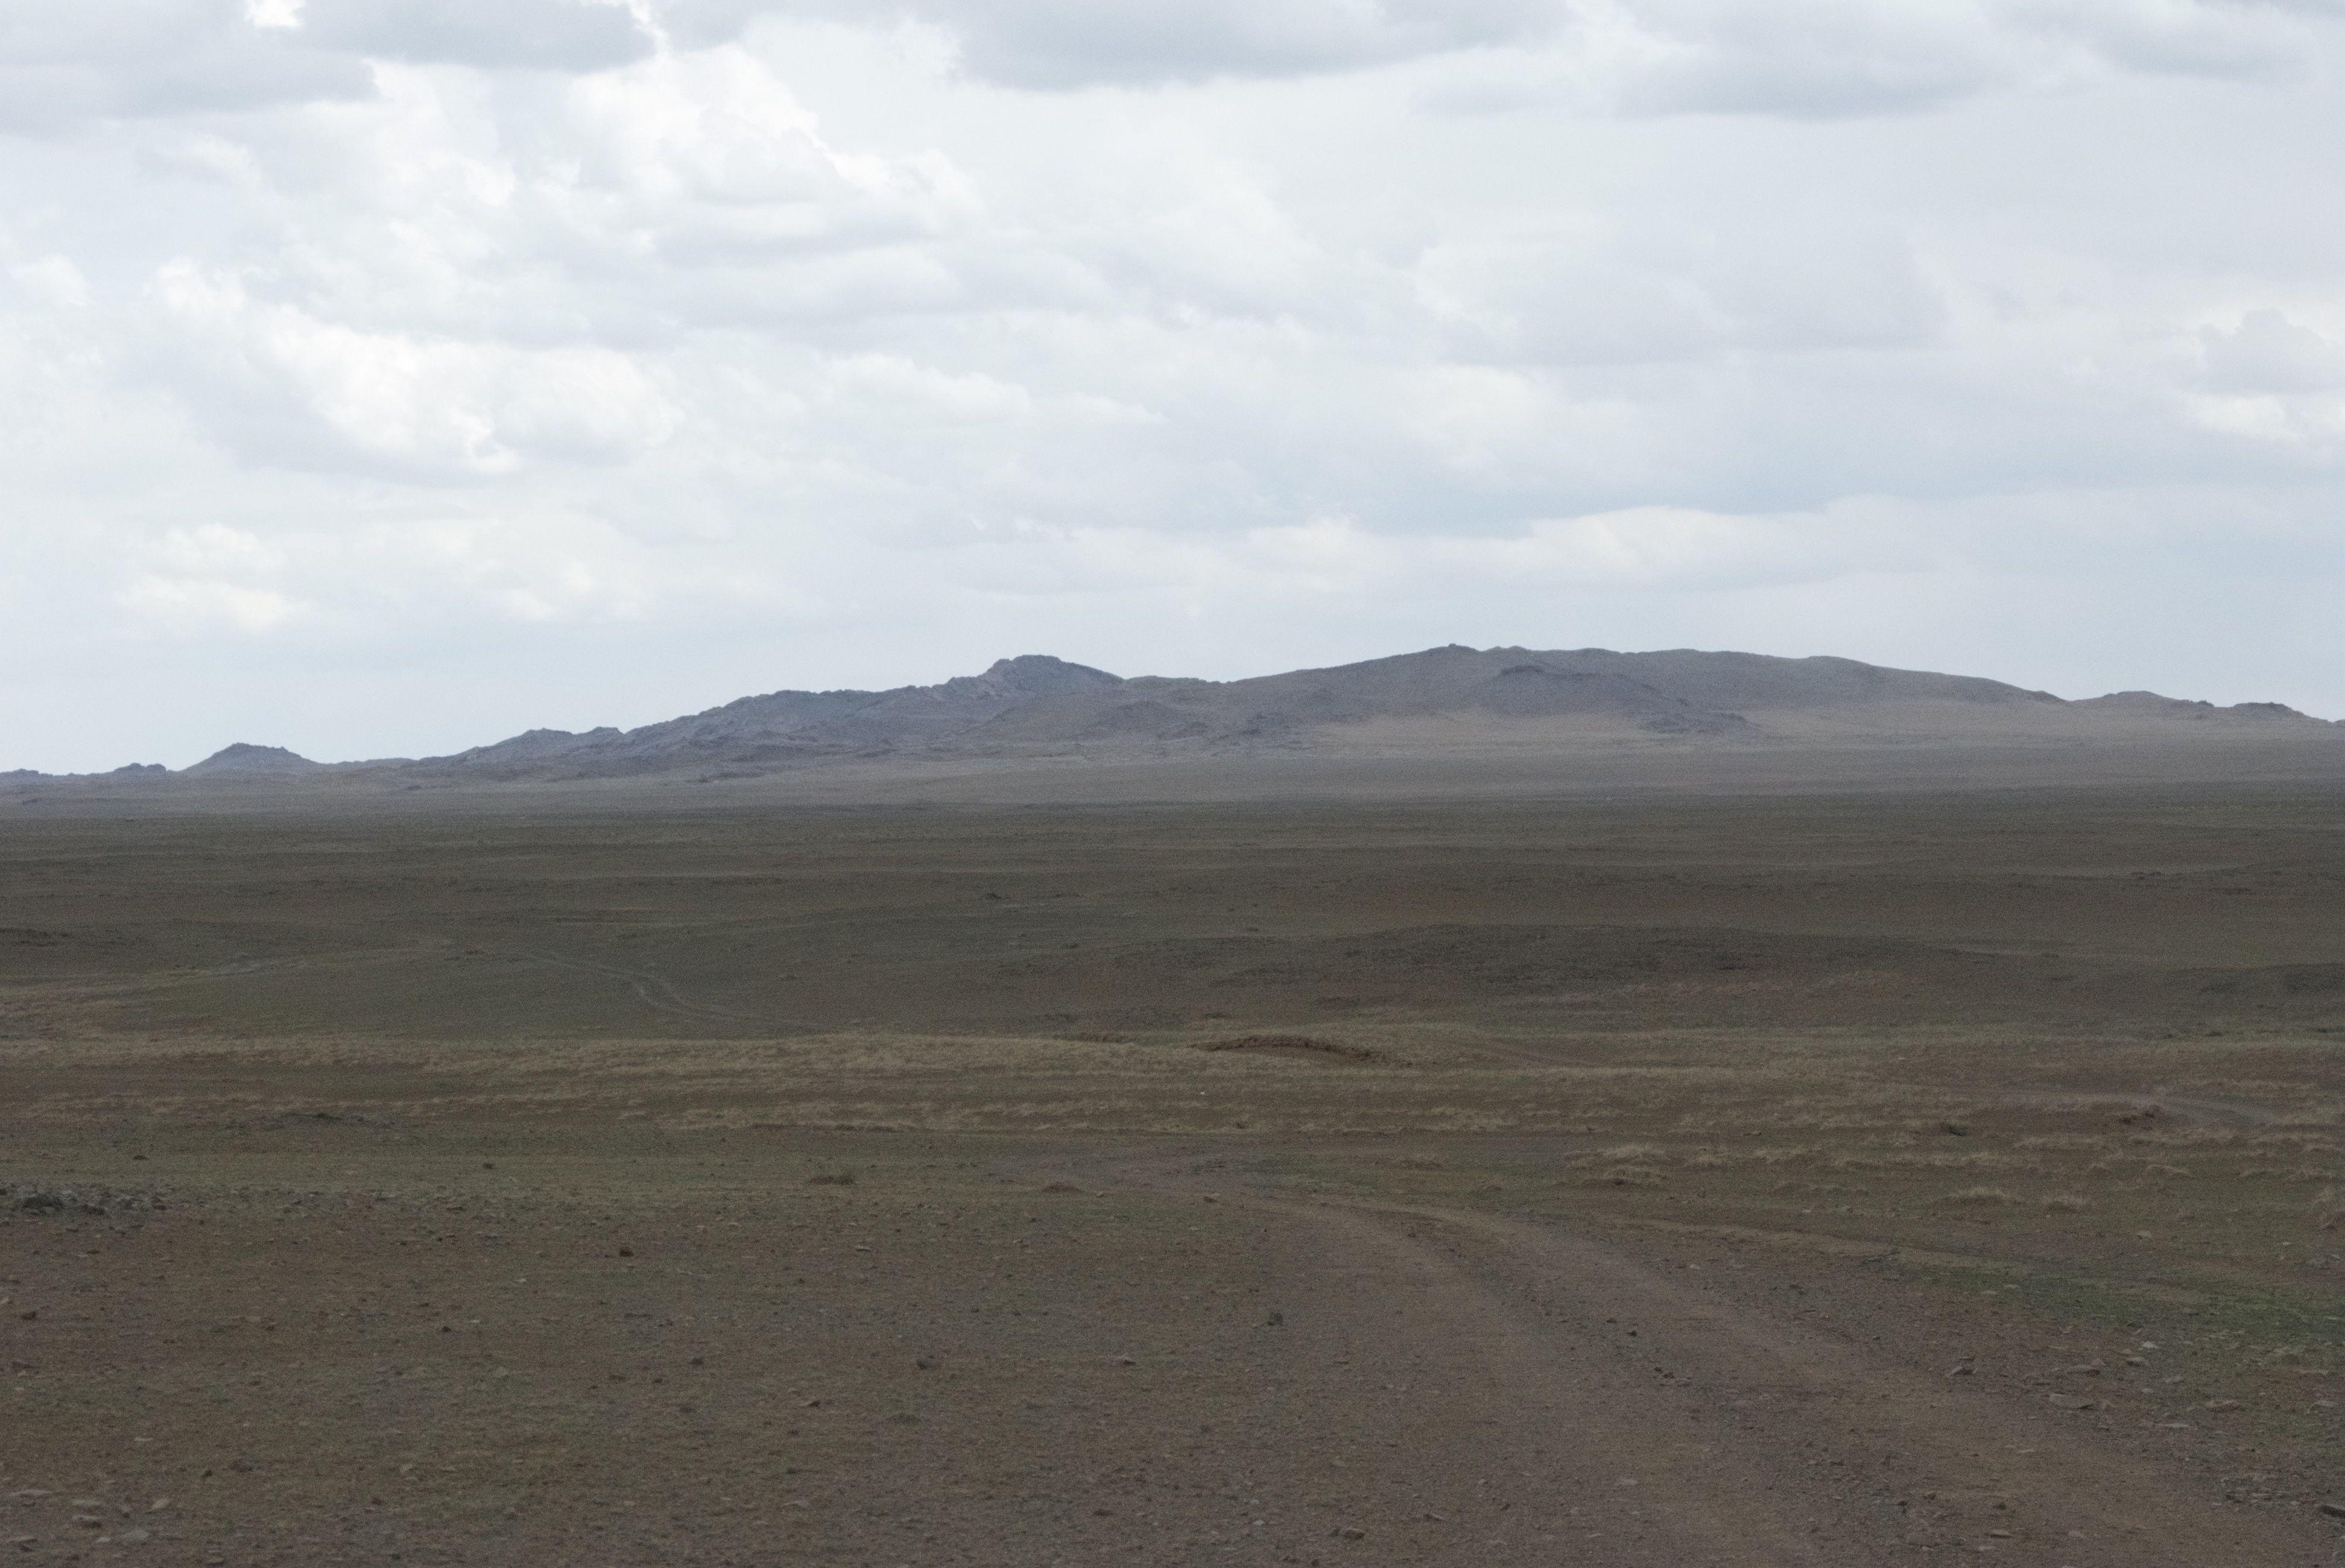 Baga Gazriin Chuluu rises out of the steppe